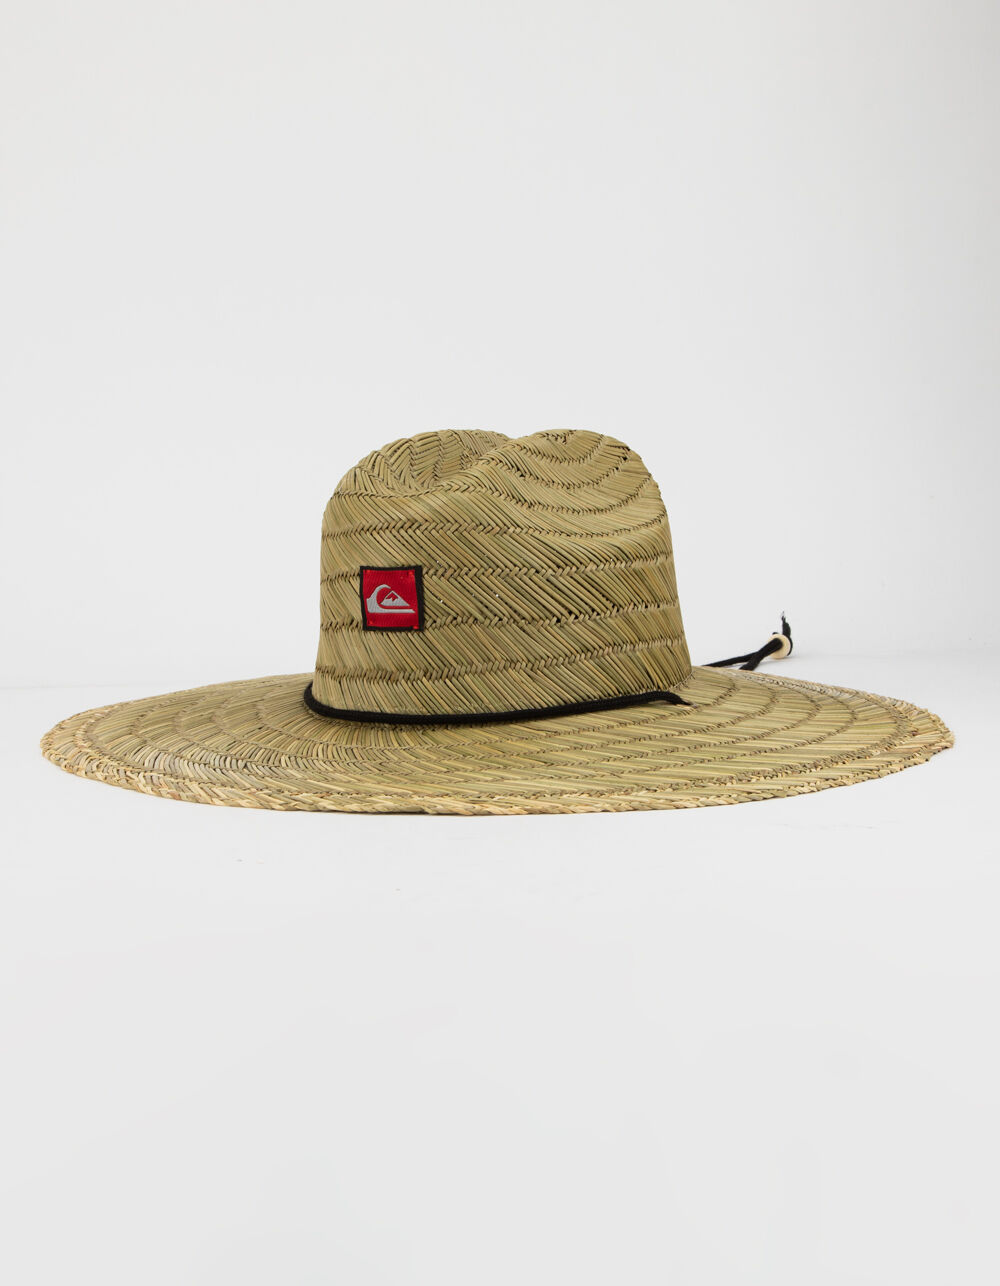 QUIKSILVER Pierside Natural Lifeguard Straw Hat